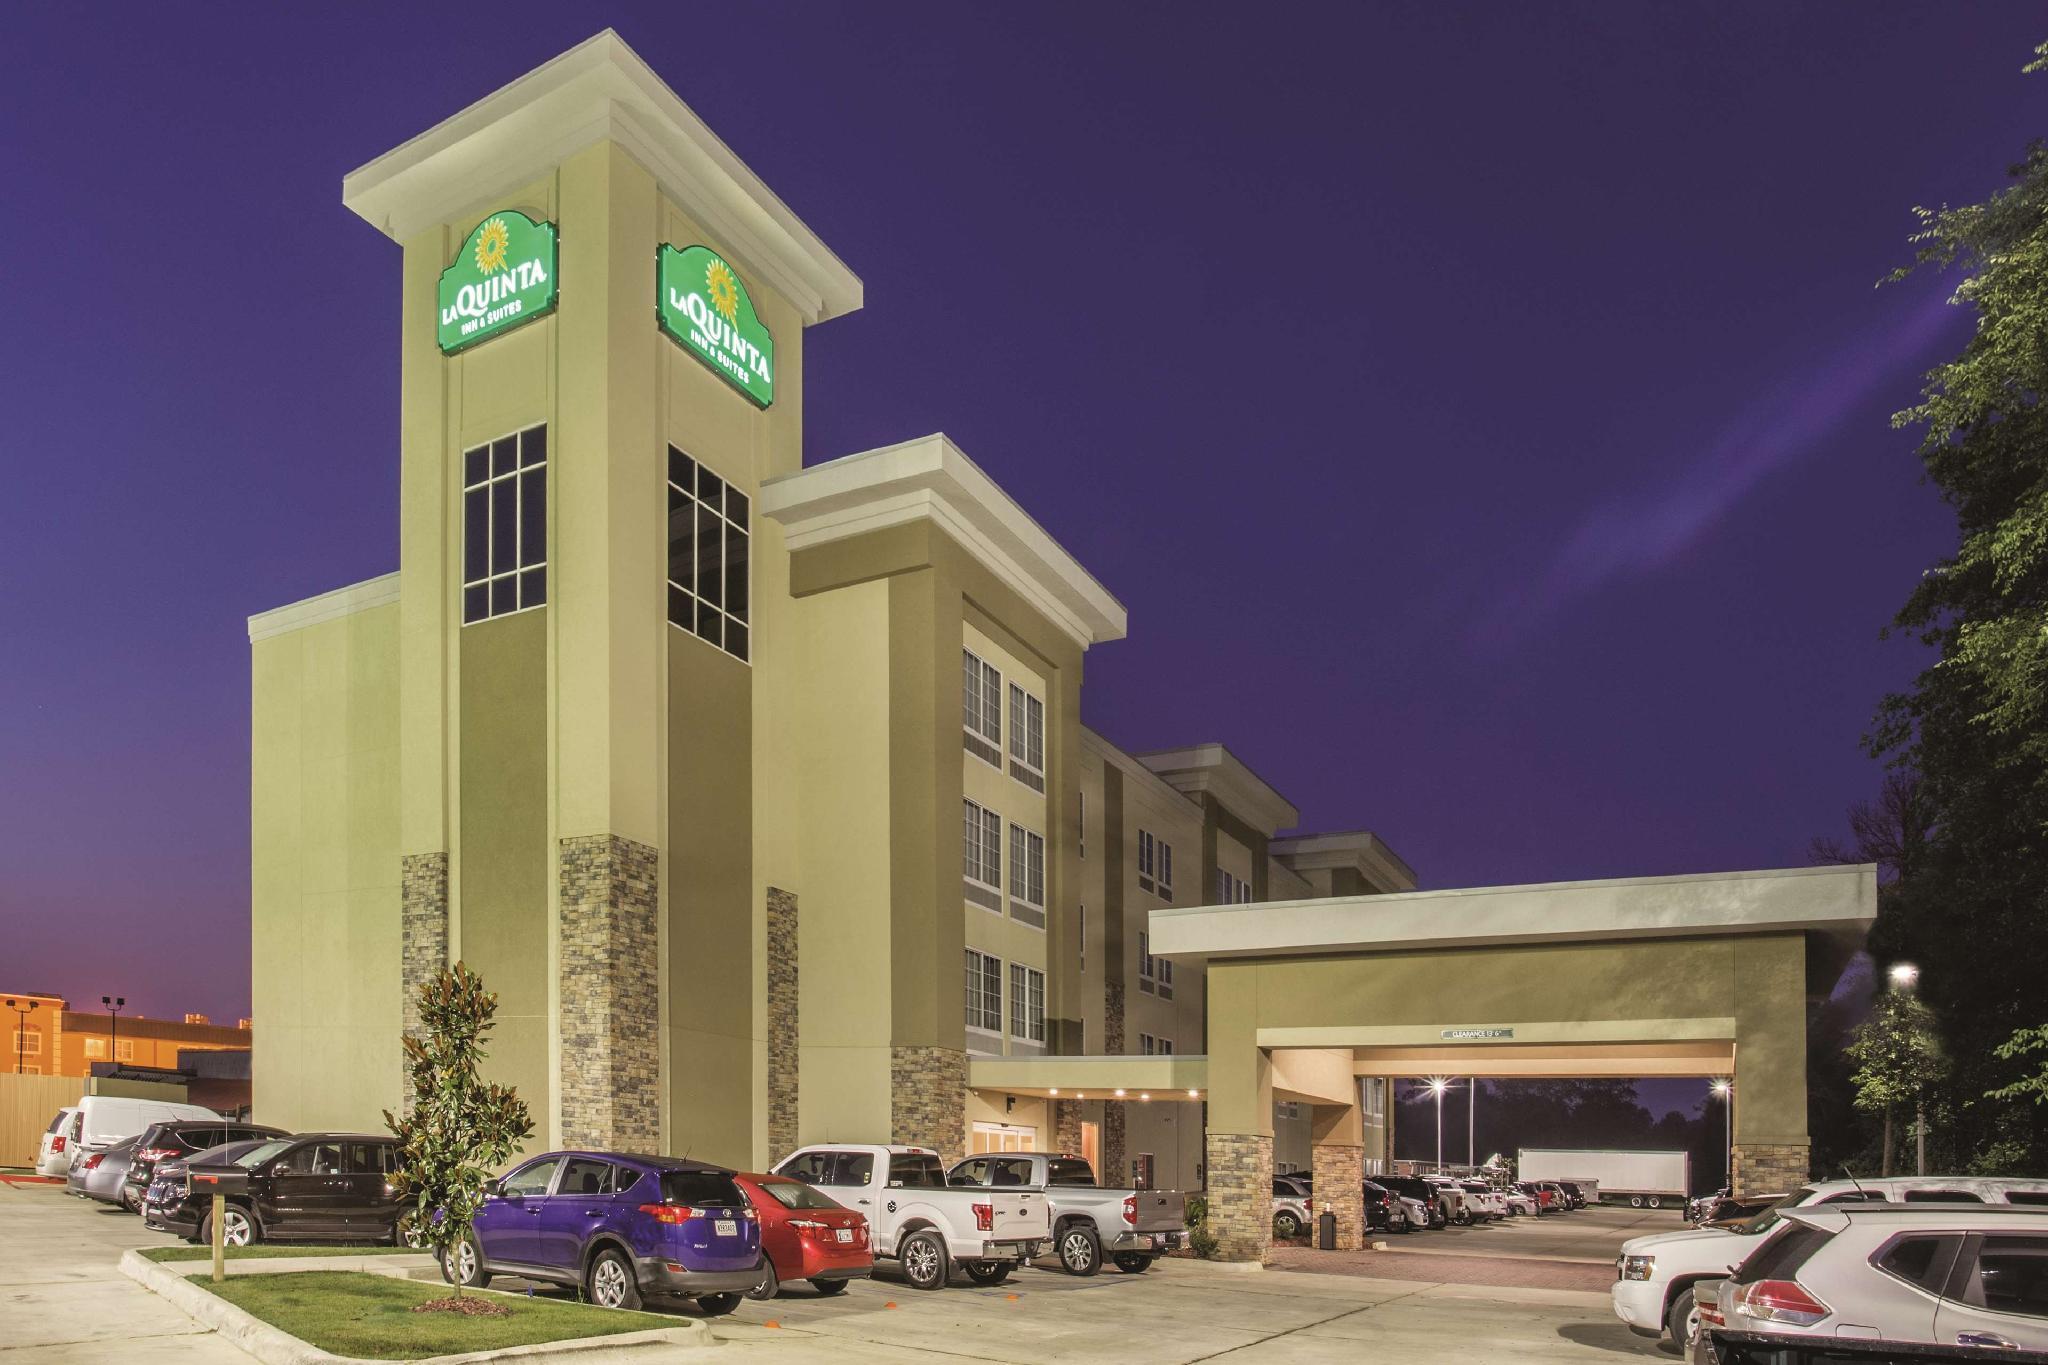 La Quinta Inn And Suites By Wyndham West Monroe